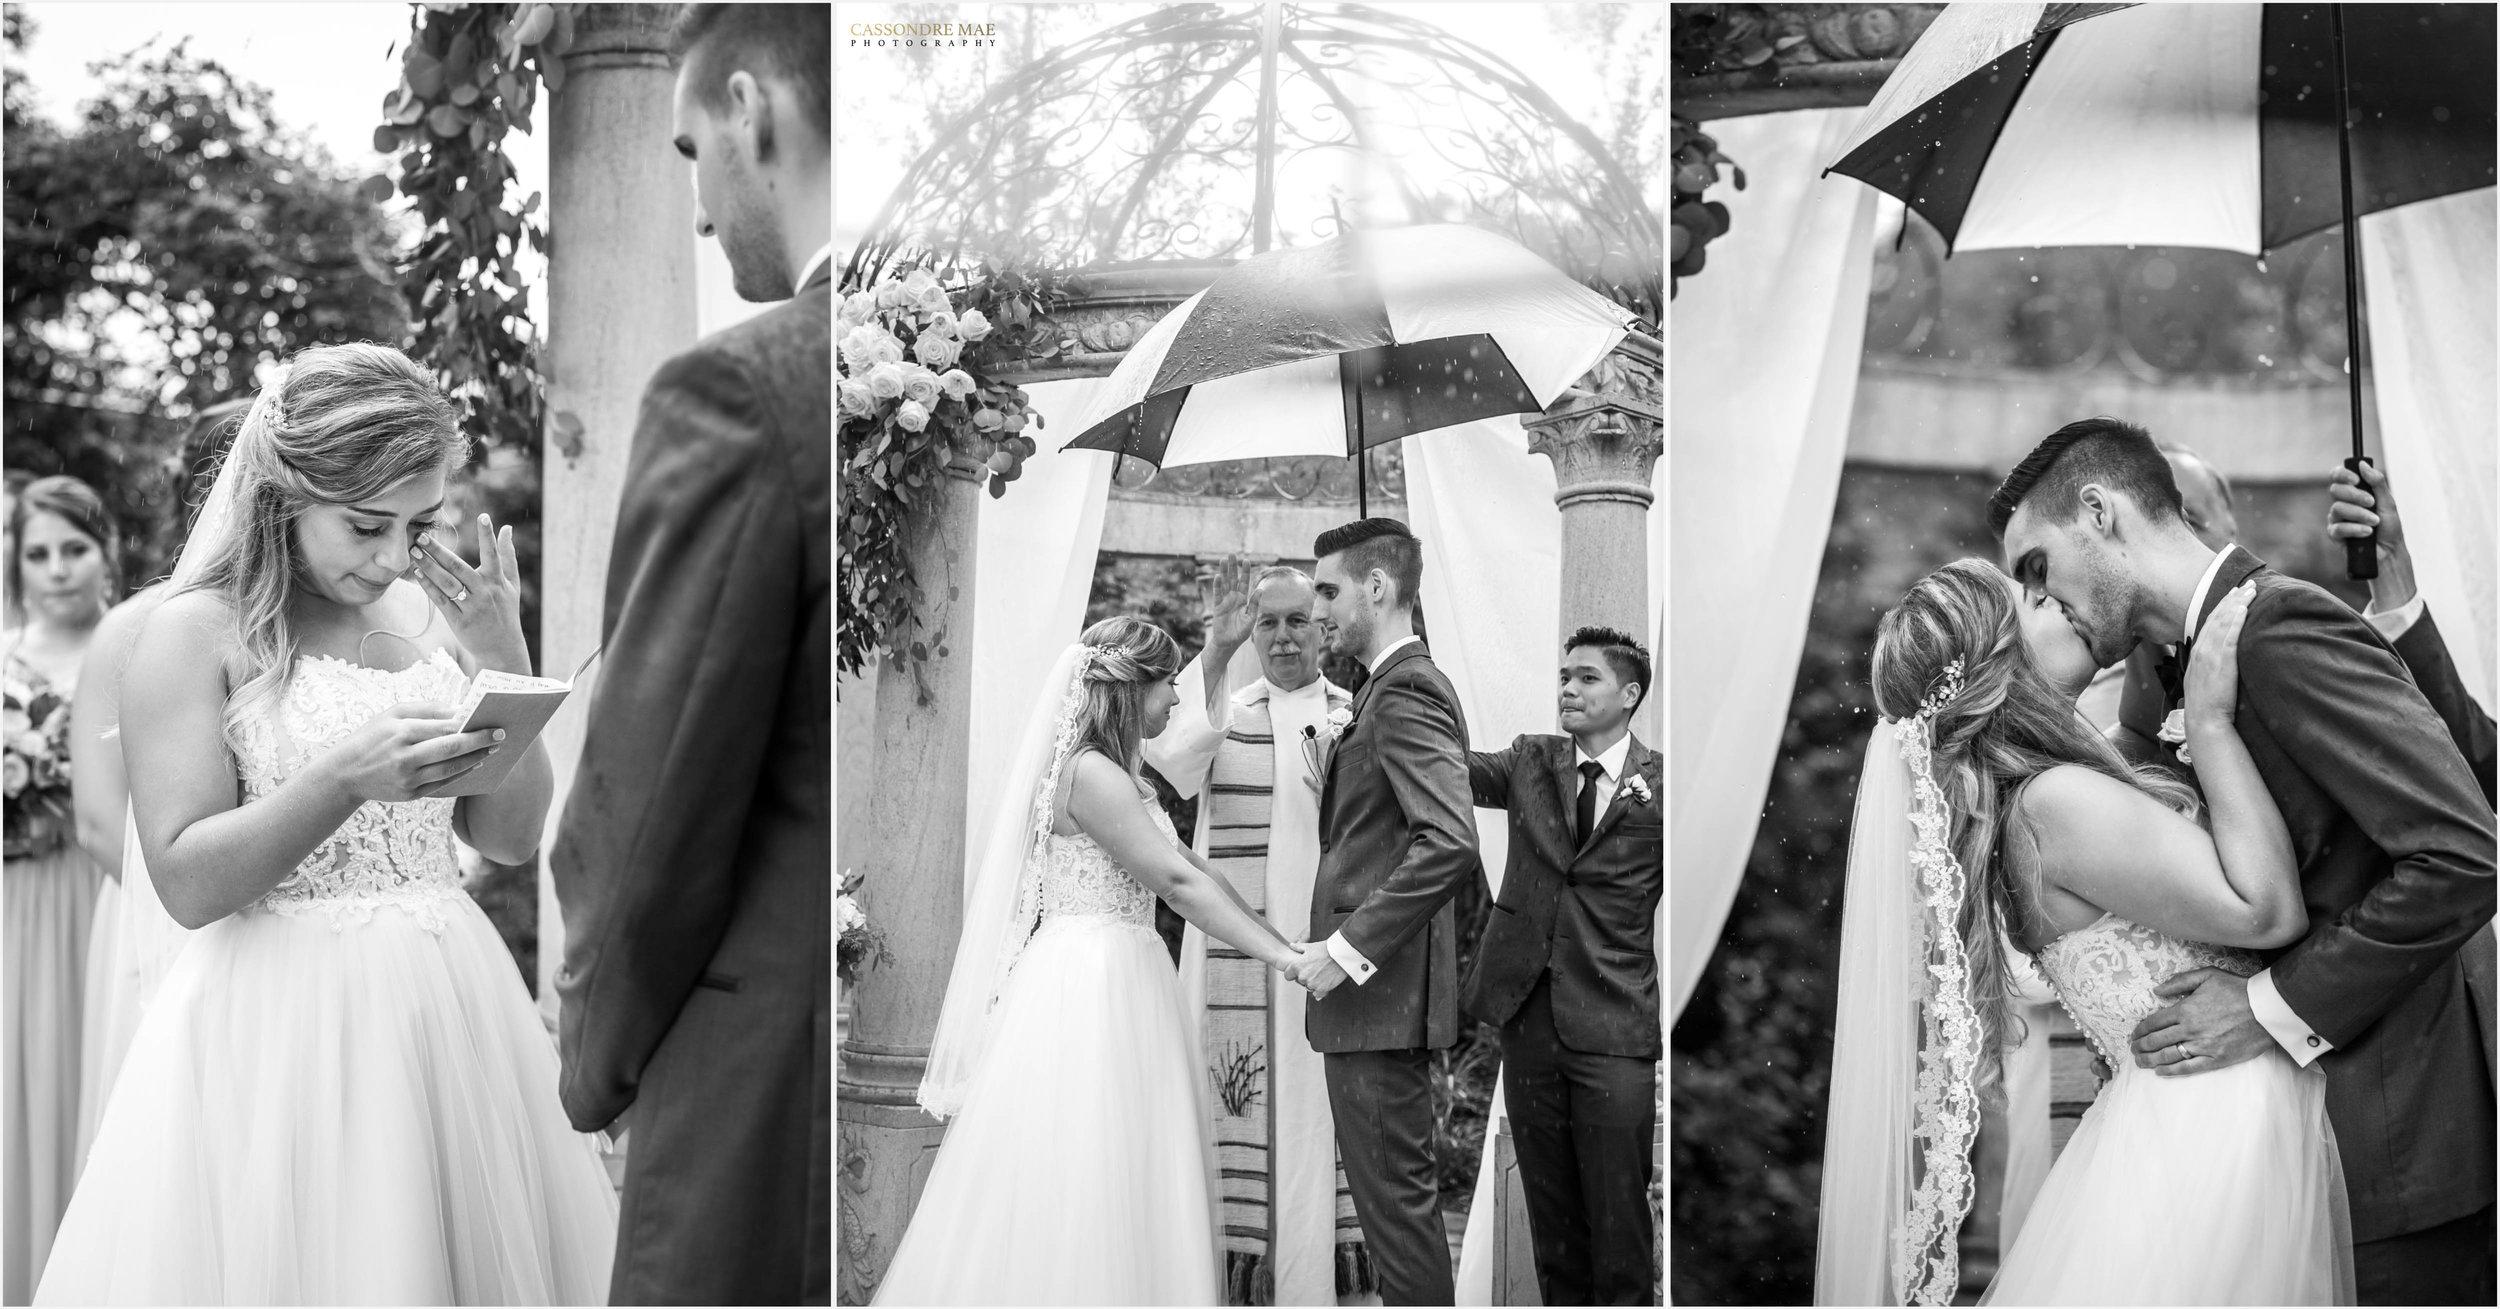 Cassondre Mae Photography Hudson Valley NY Wedding Photographer -24.jpg